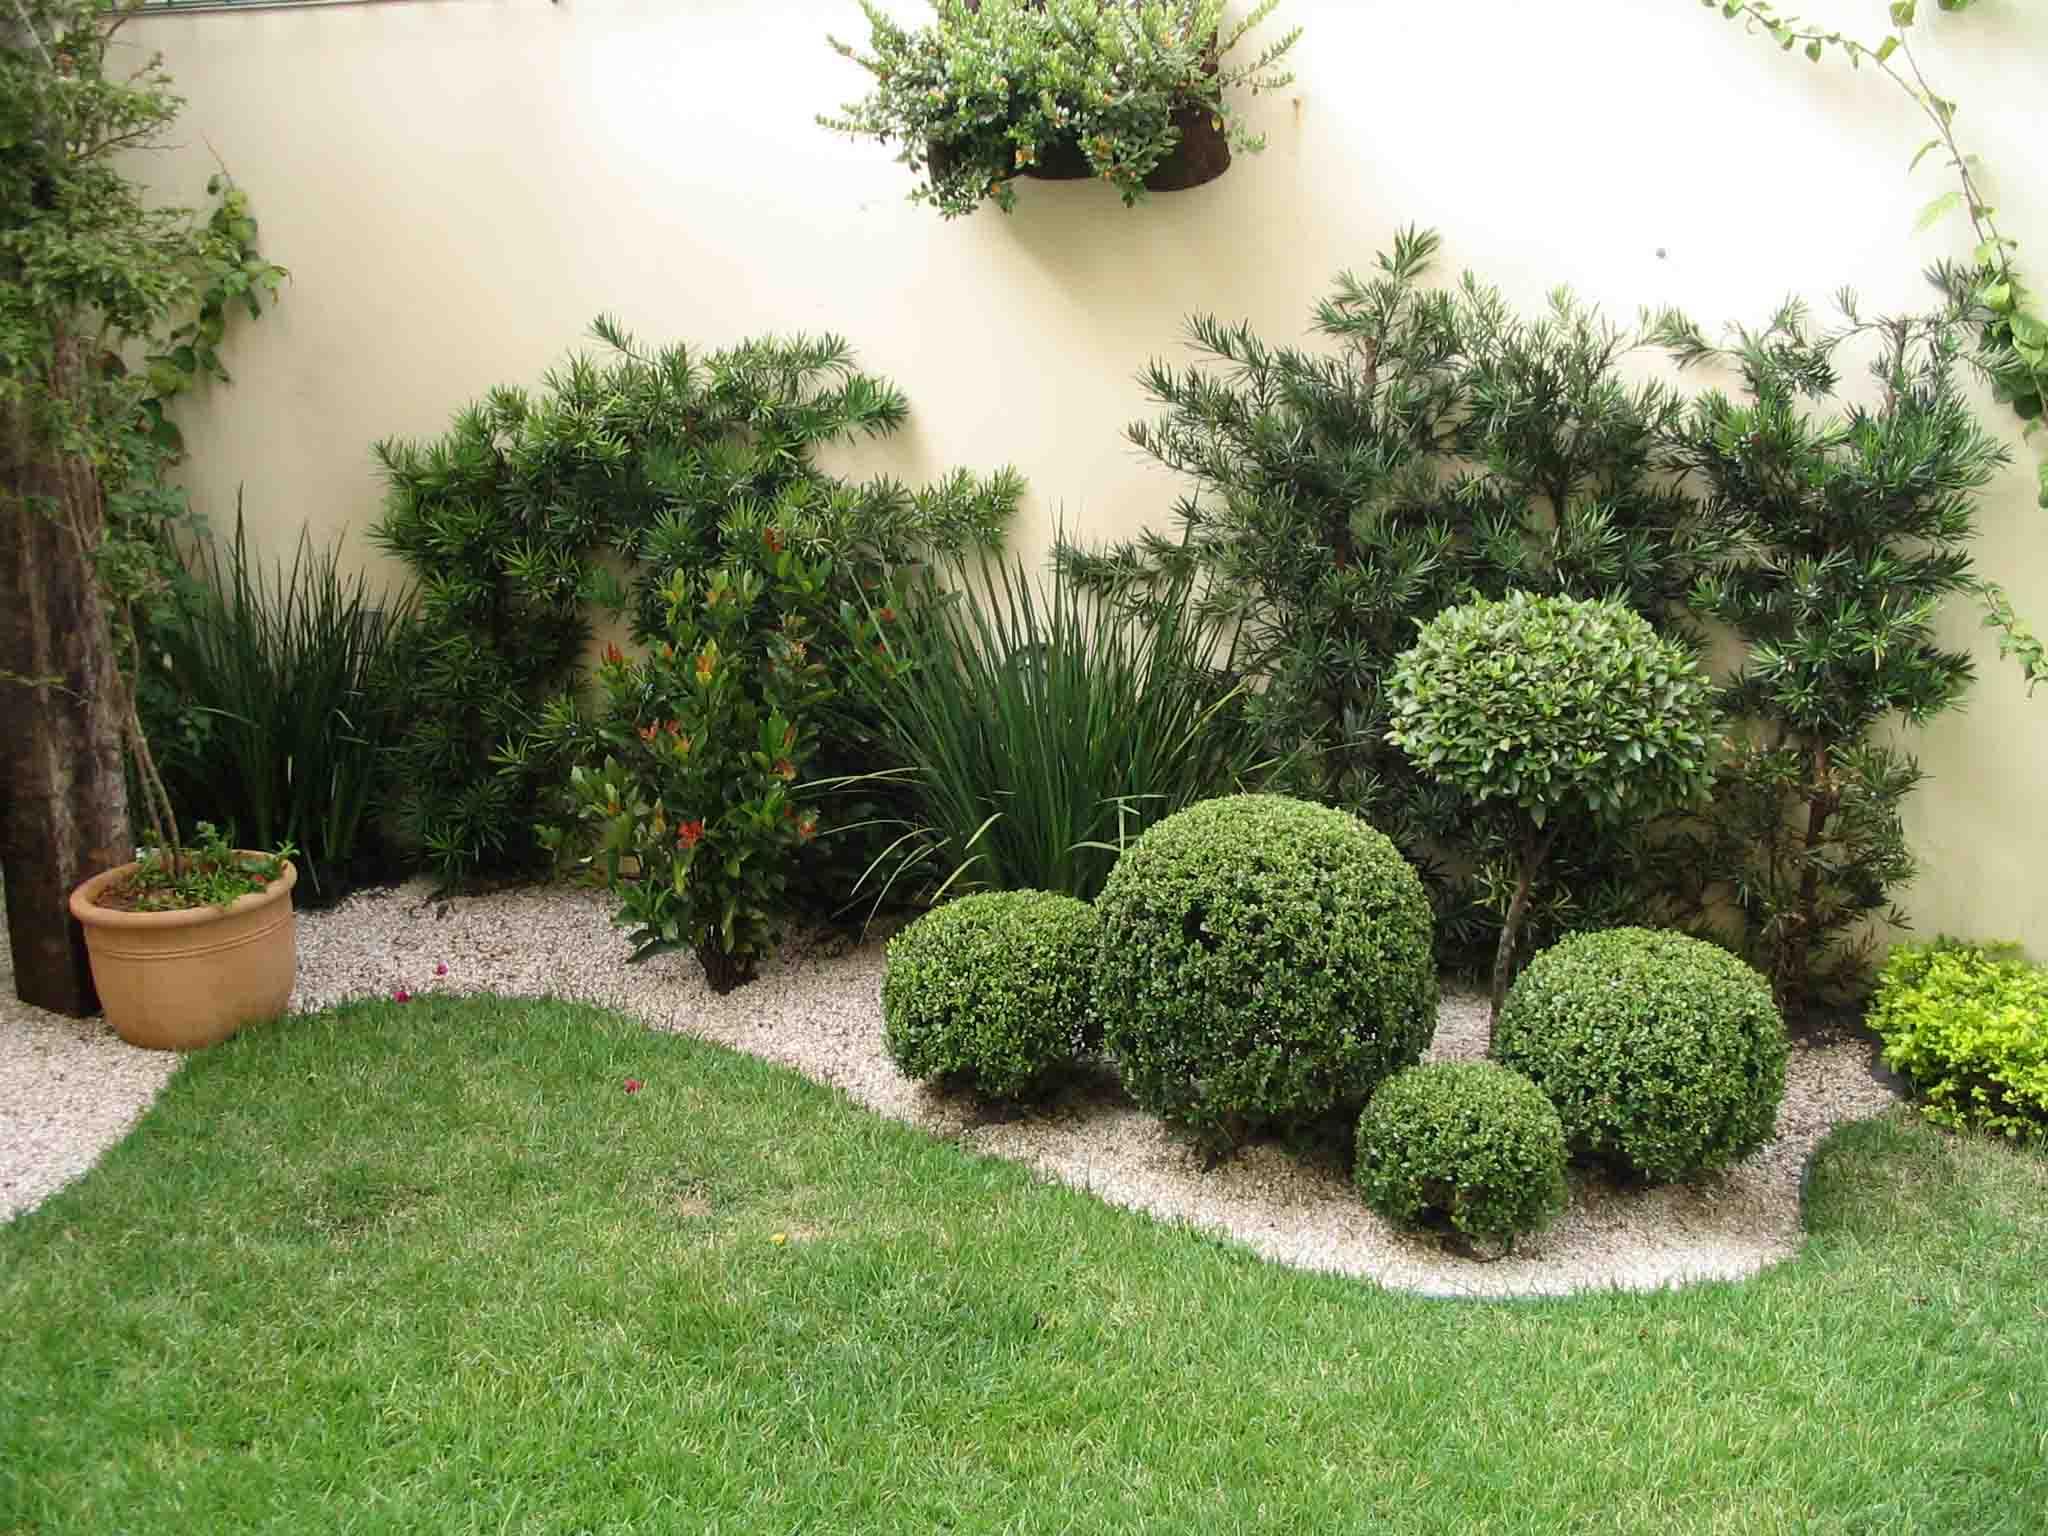 jardins quintal pequeno:Decoracao De Jardim Pequeno